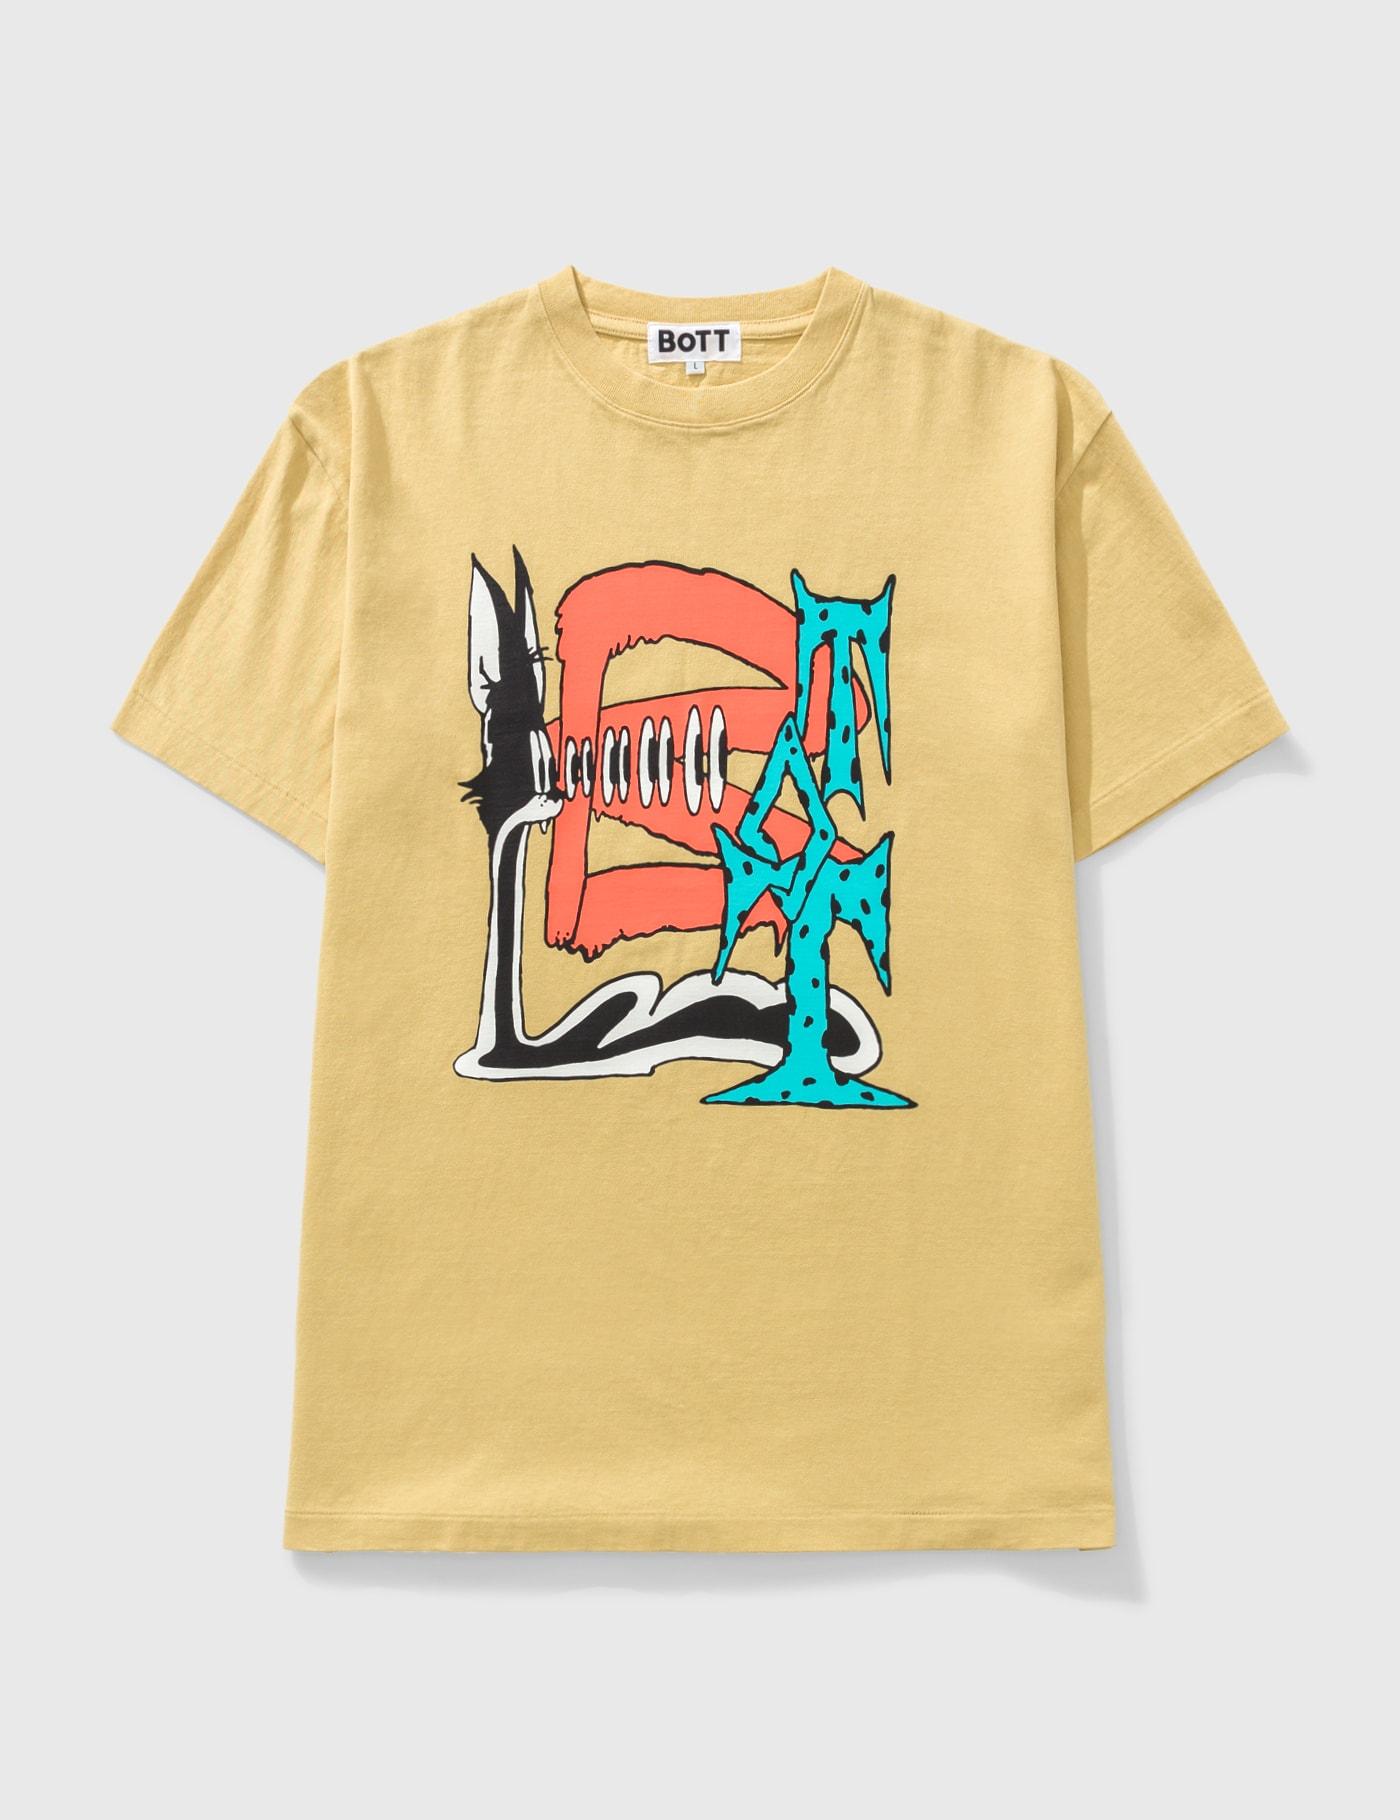 Bott Shock T-shirt In Yellow